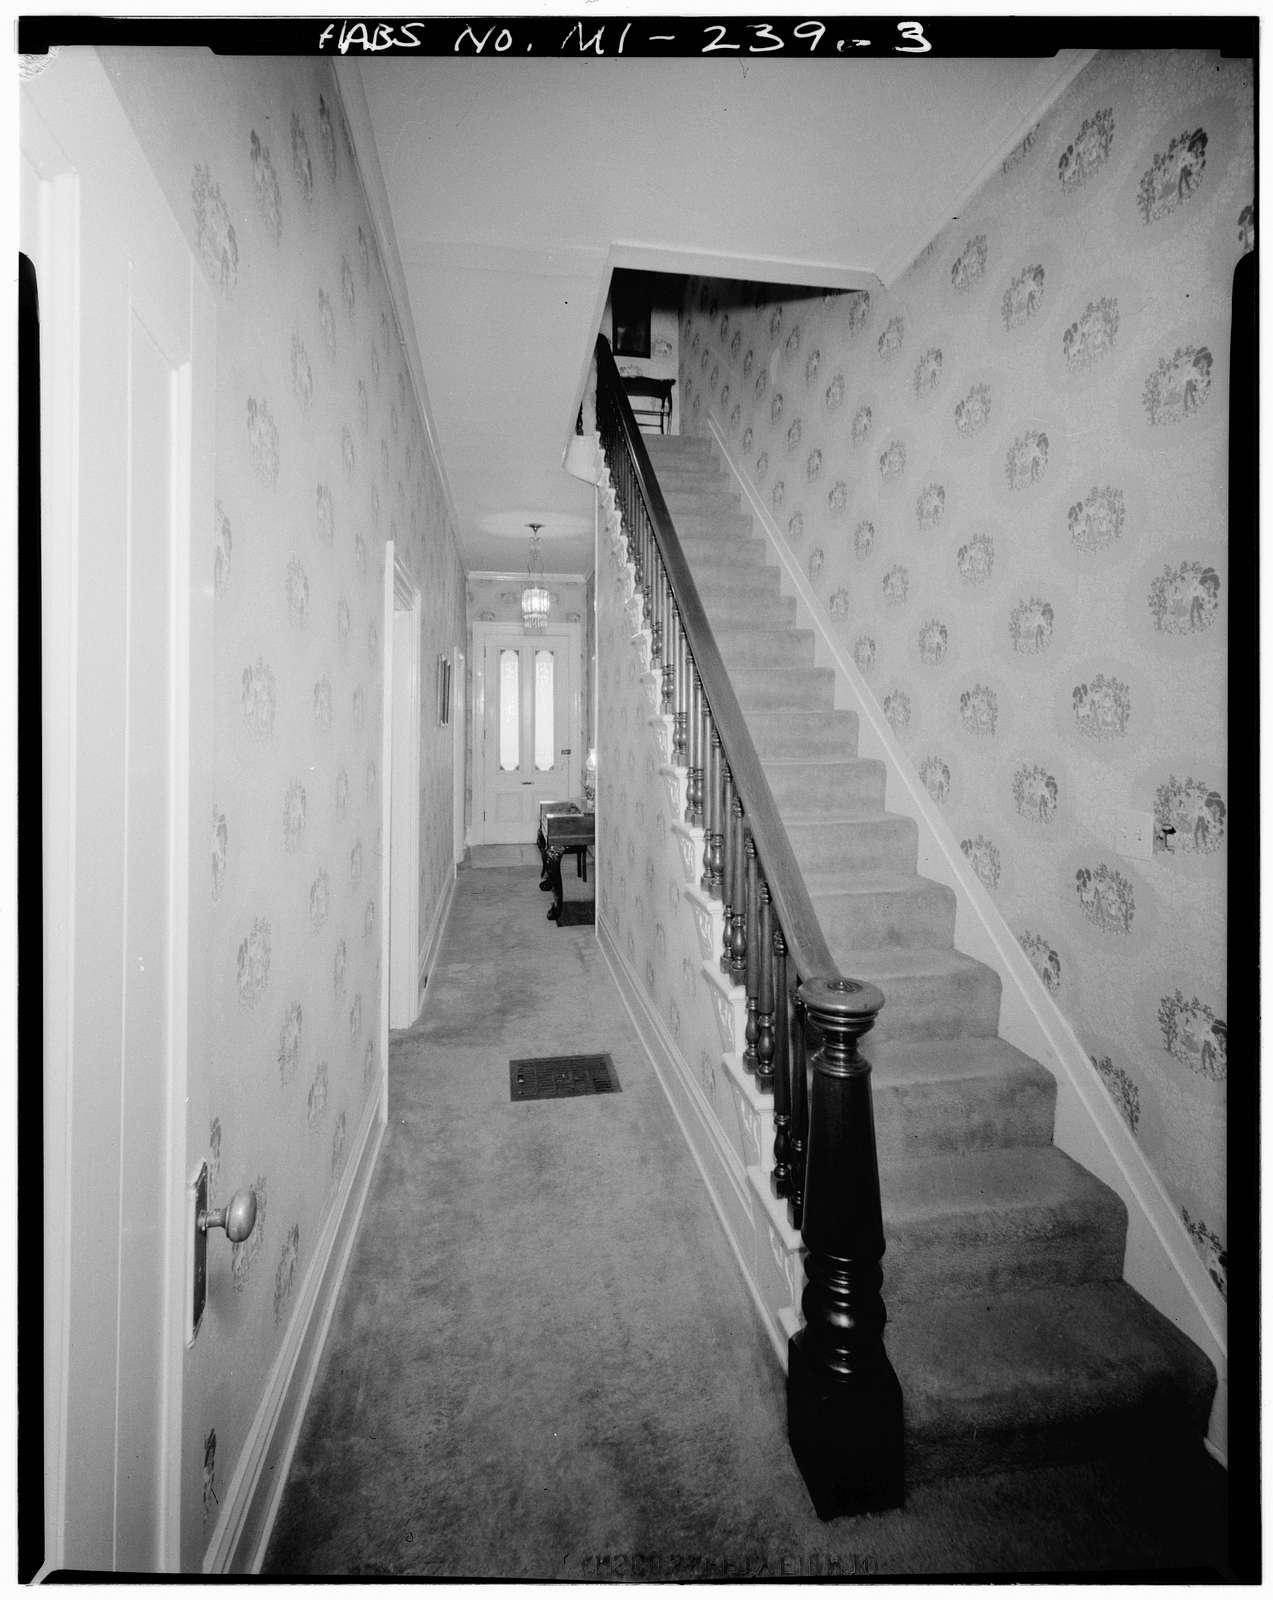 Sidney S. Allcott House, 302 West Mansion Street, Marshall, Calhoun County, MI